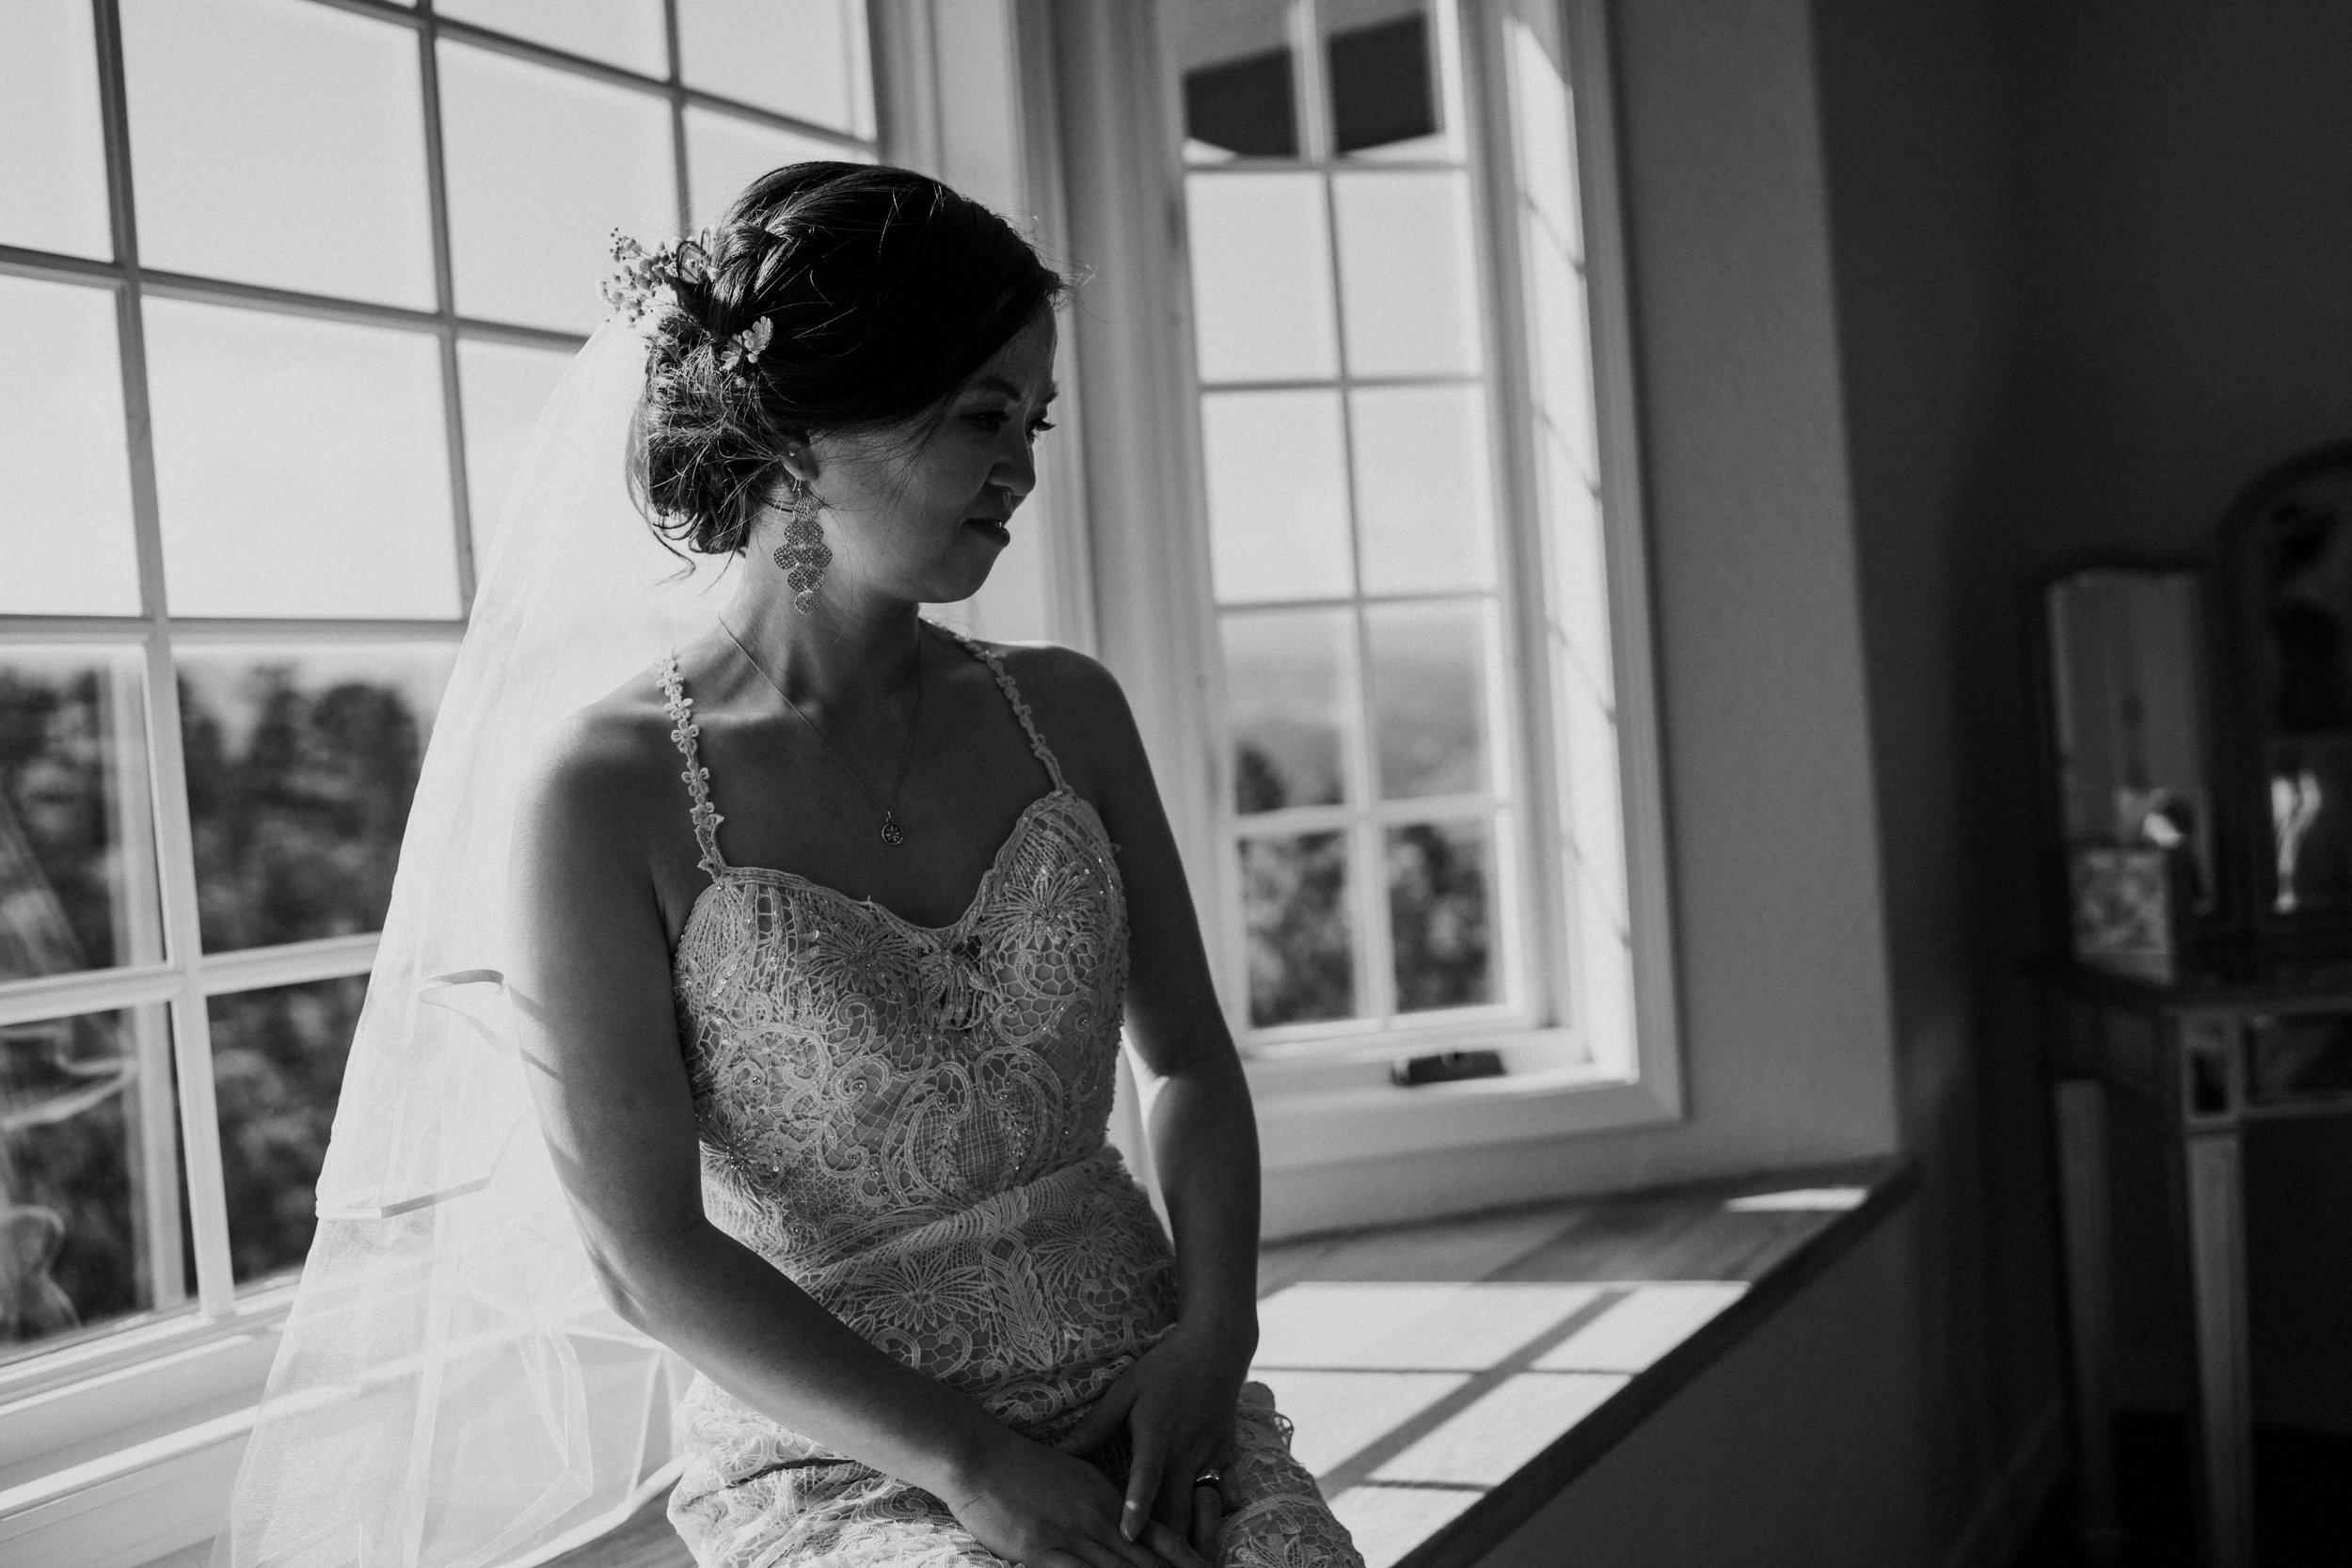 denver wedding photographer lioncrest manor in lyons ben and mali -DSC06190.jpg